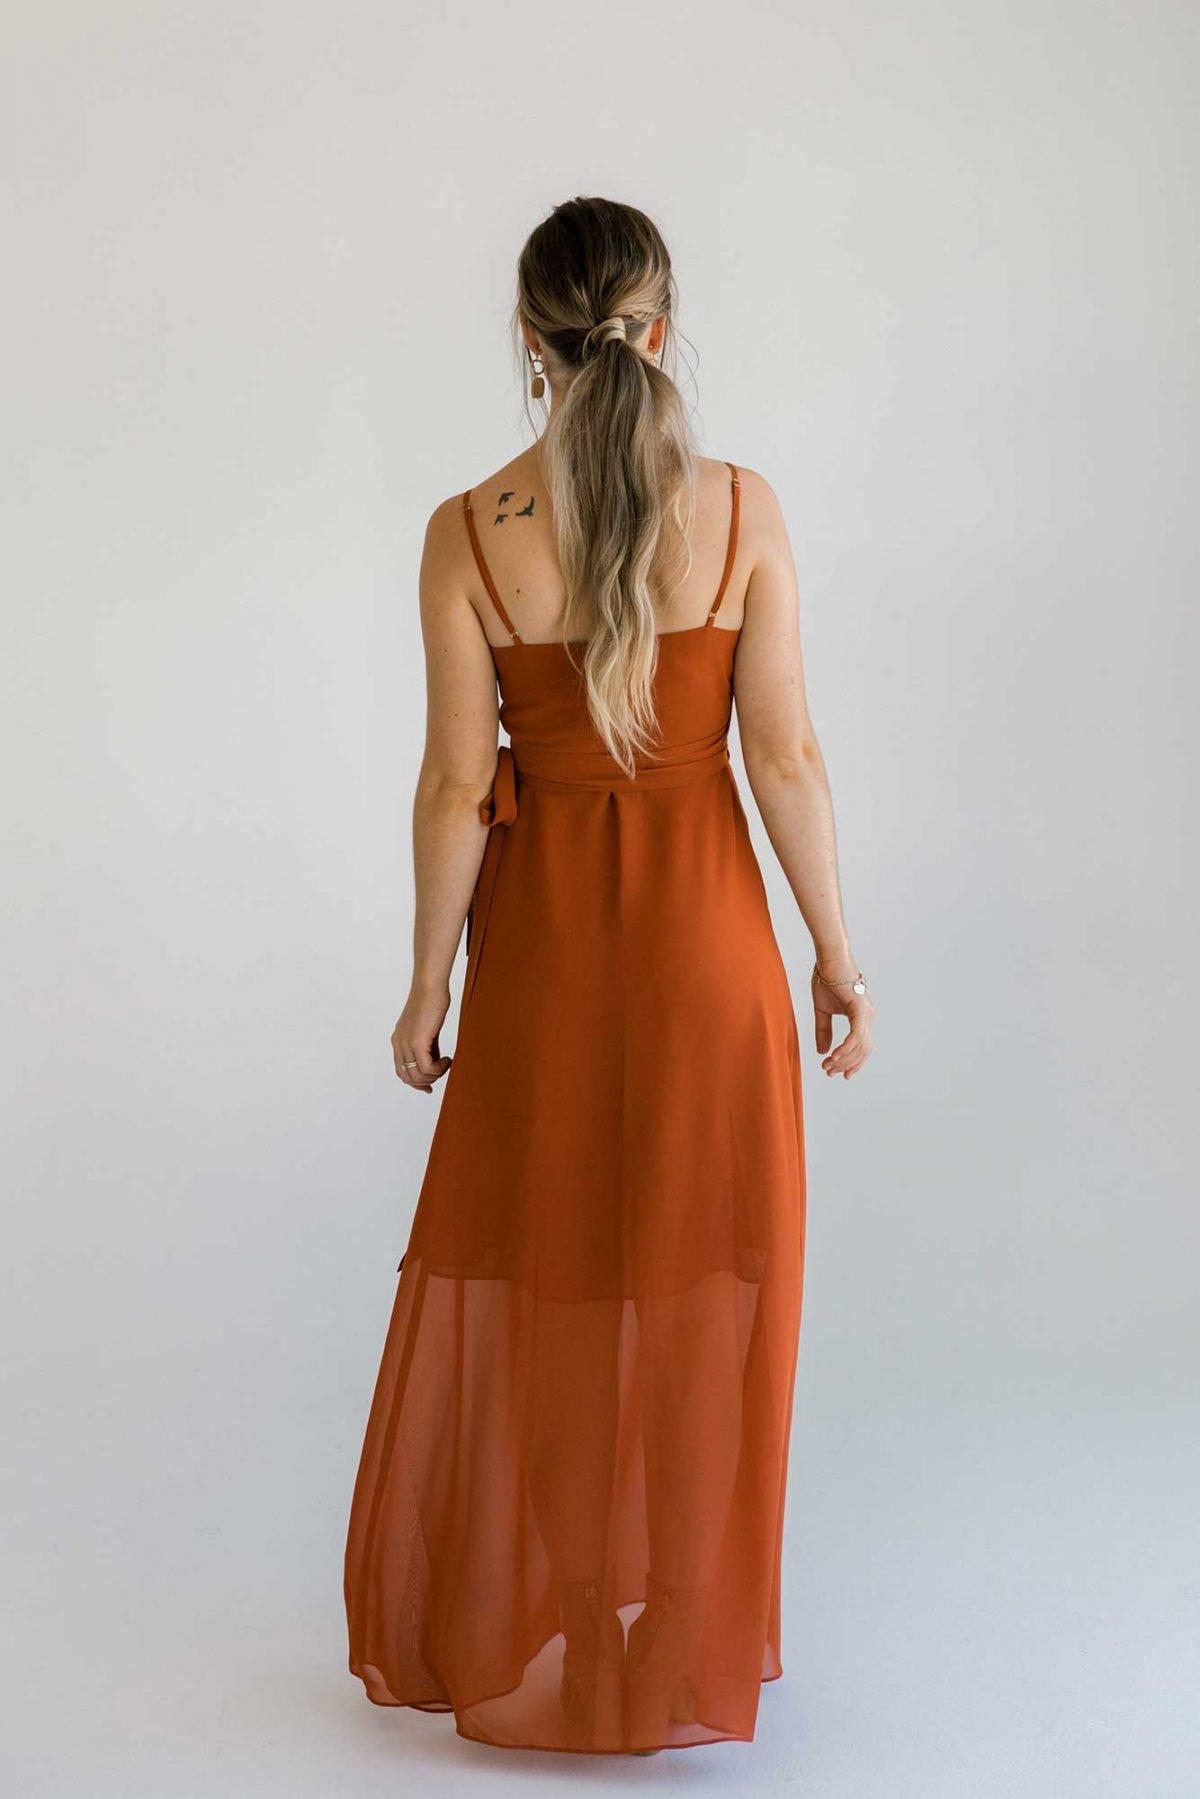 Lucinda dress in burnt orange colour back view